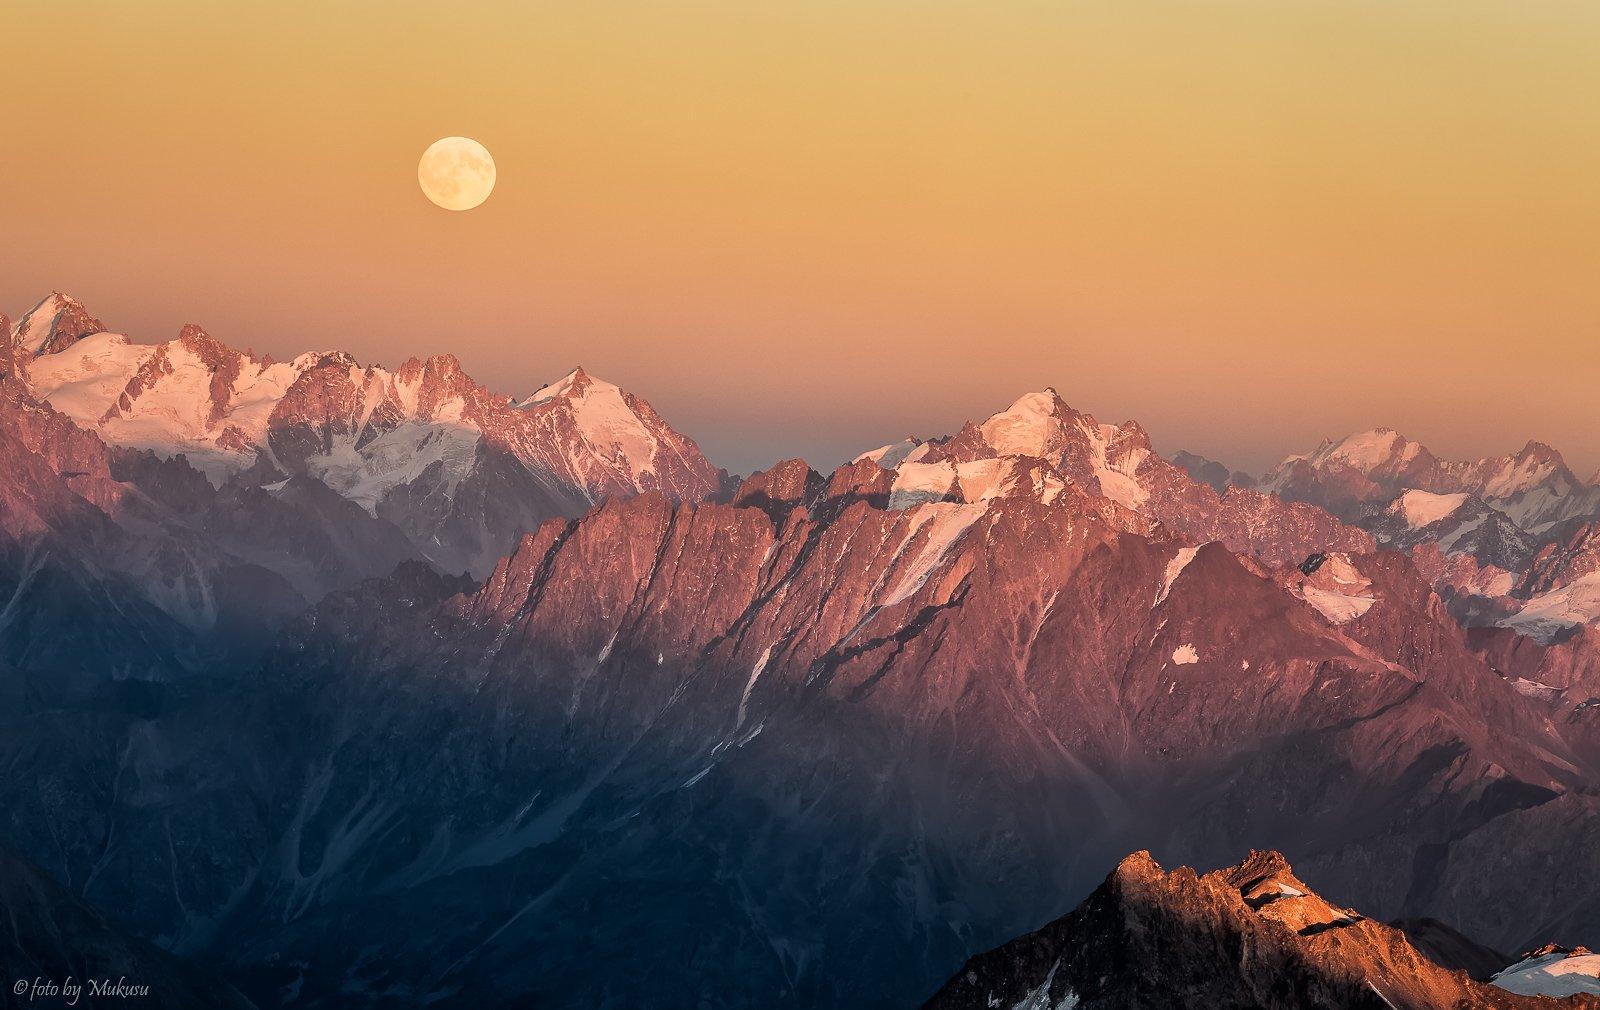 landscape, travel, mountain, moon, kavkaz, эльбрус, кавказ, горы, пейзаж, путешествия, Алексей Самойленко